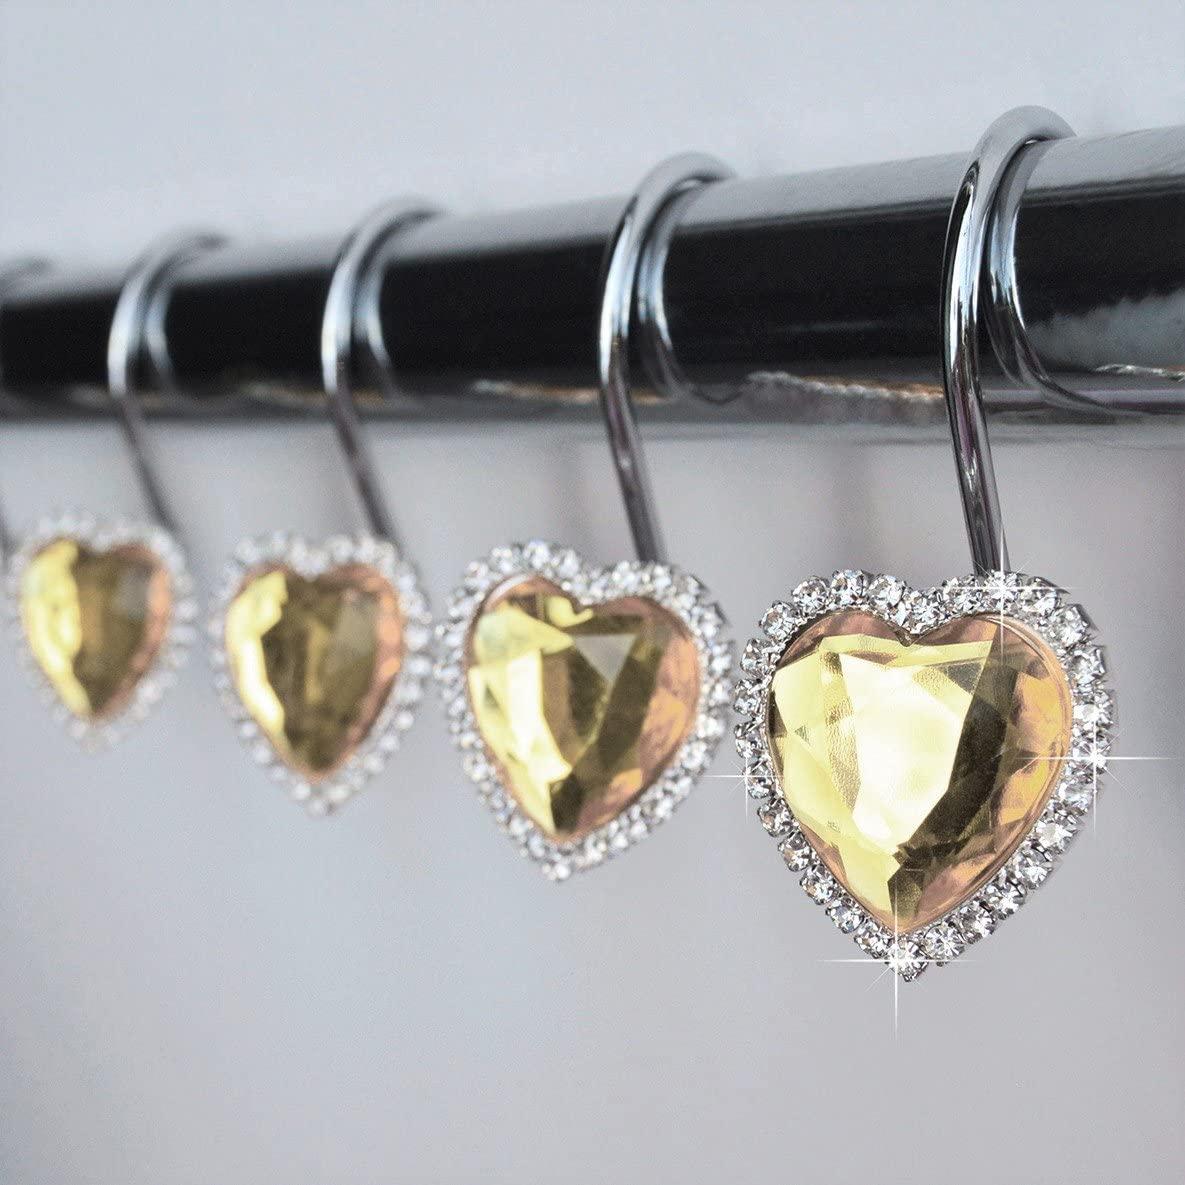 American Cuteness Shower Curtain Hooks Rings - Heart Yellow Champagne Decorative Crystal Diamond Bling Rhinestones Bathroom Bath Set Gift Valentine Girls (Champagne)